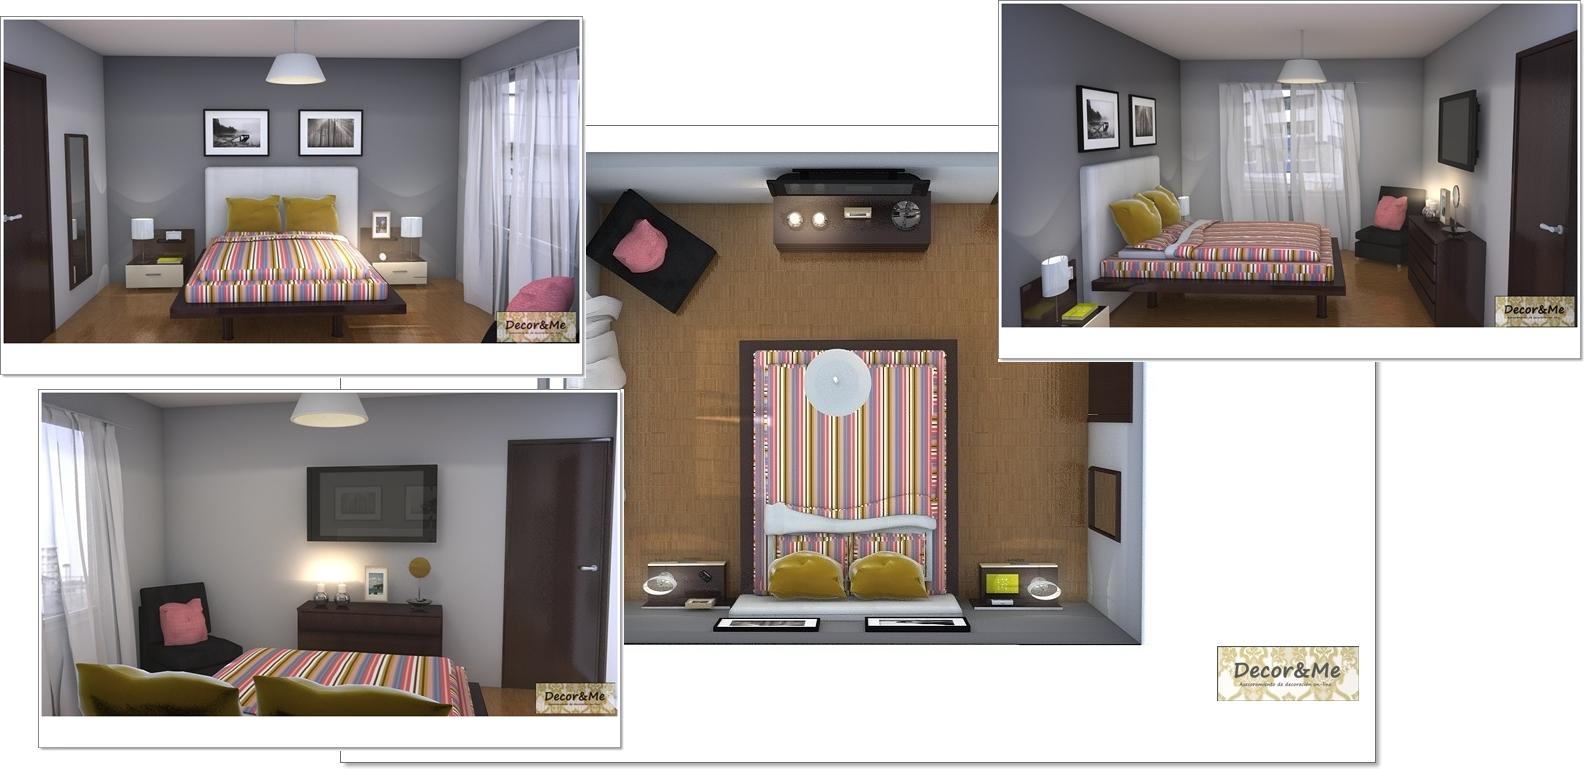 Decor me proyecto de piso en m xico dormitorio principal - Zara home cortinas dormitorio ...